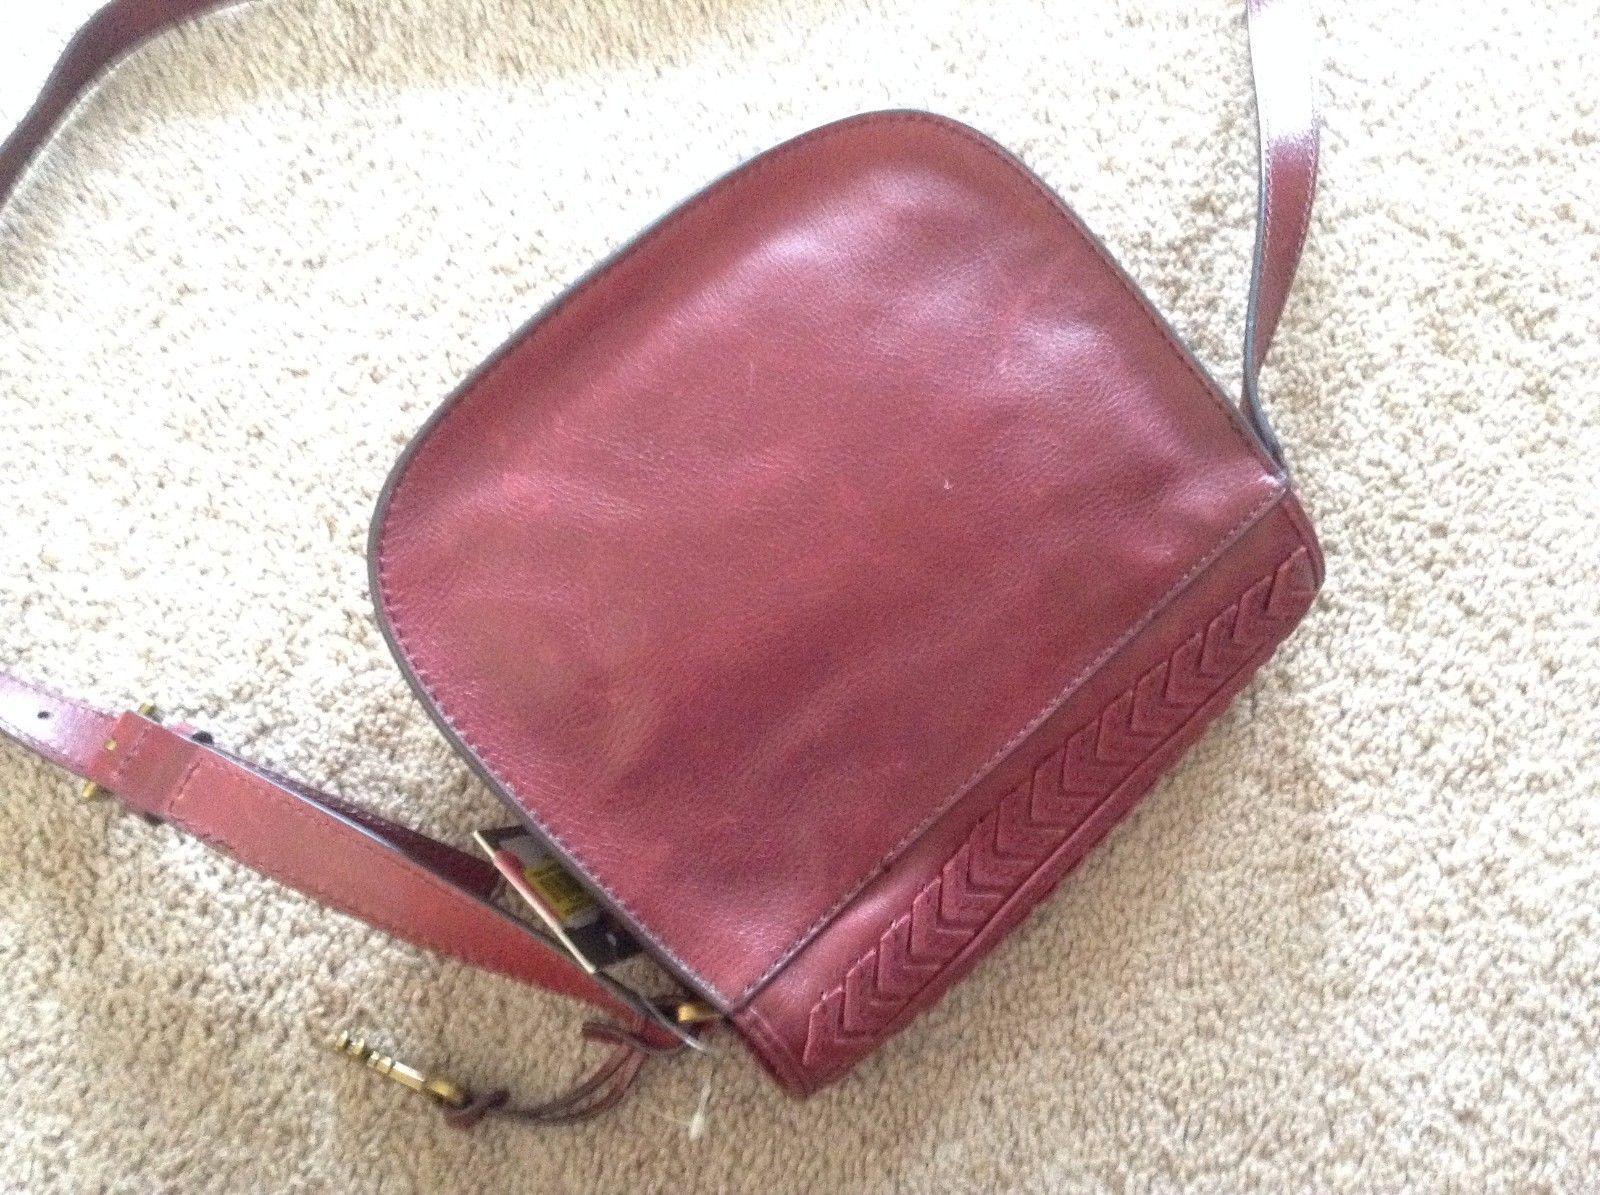 NWT $178 Fossil Emi Tassel Saddle Crossbody Bag Wine purse new